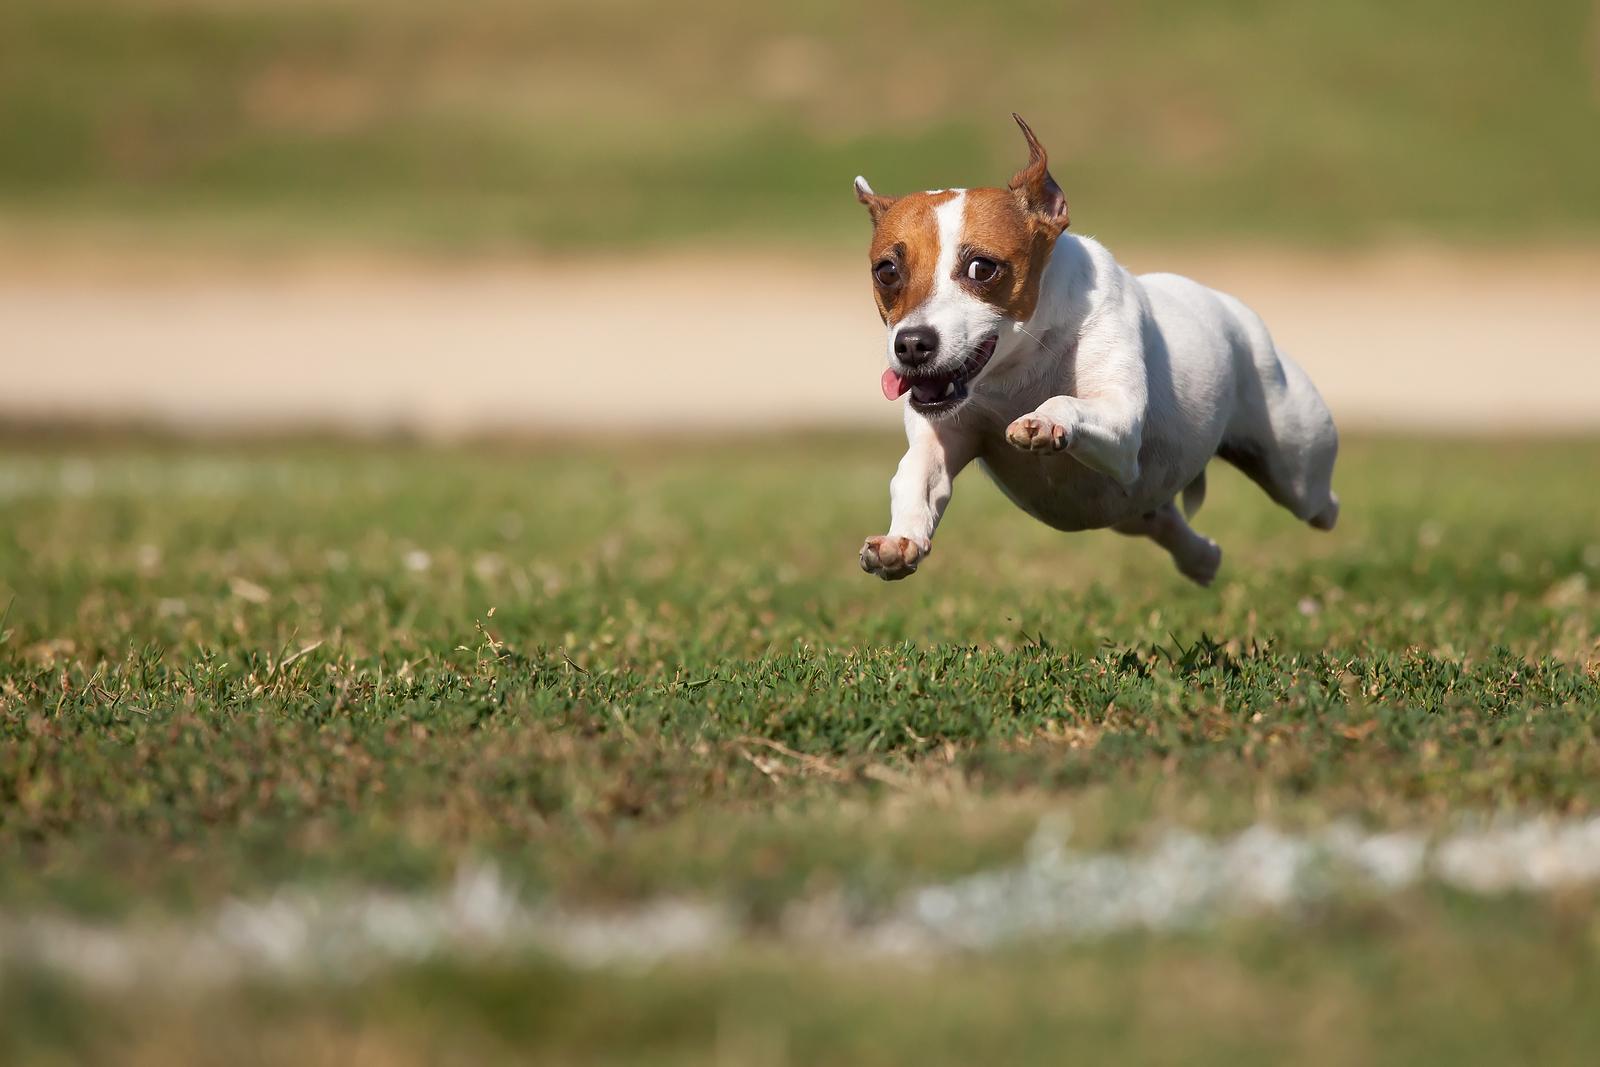 High Resolution Wallpaper | Jack Russell Terrier 1600x1067 px